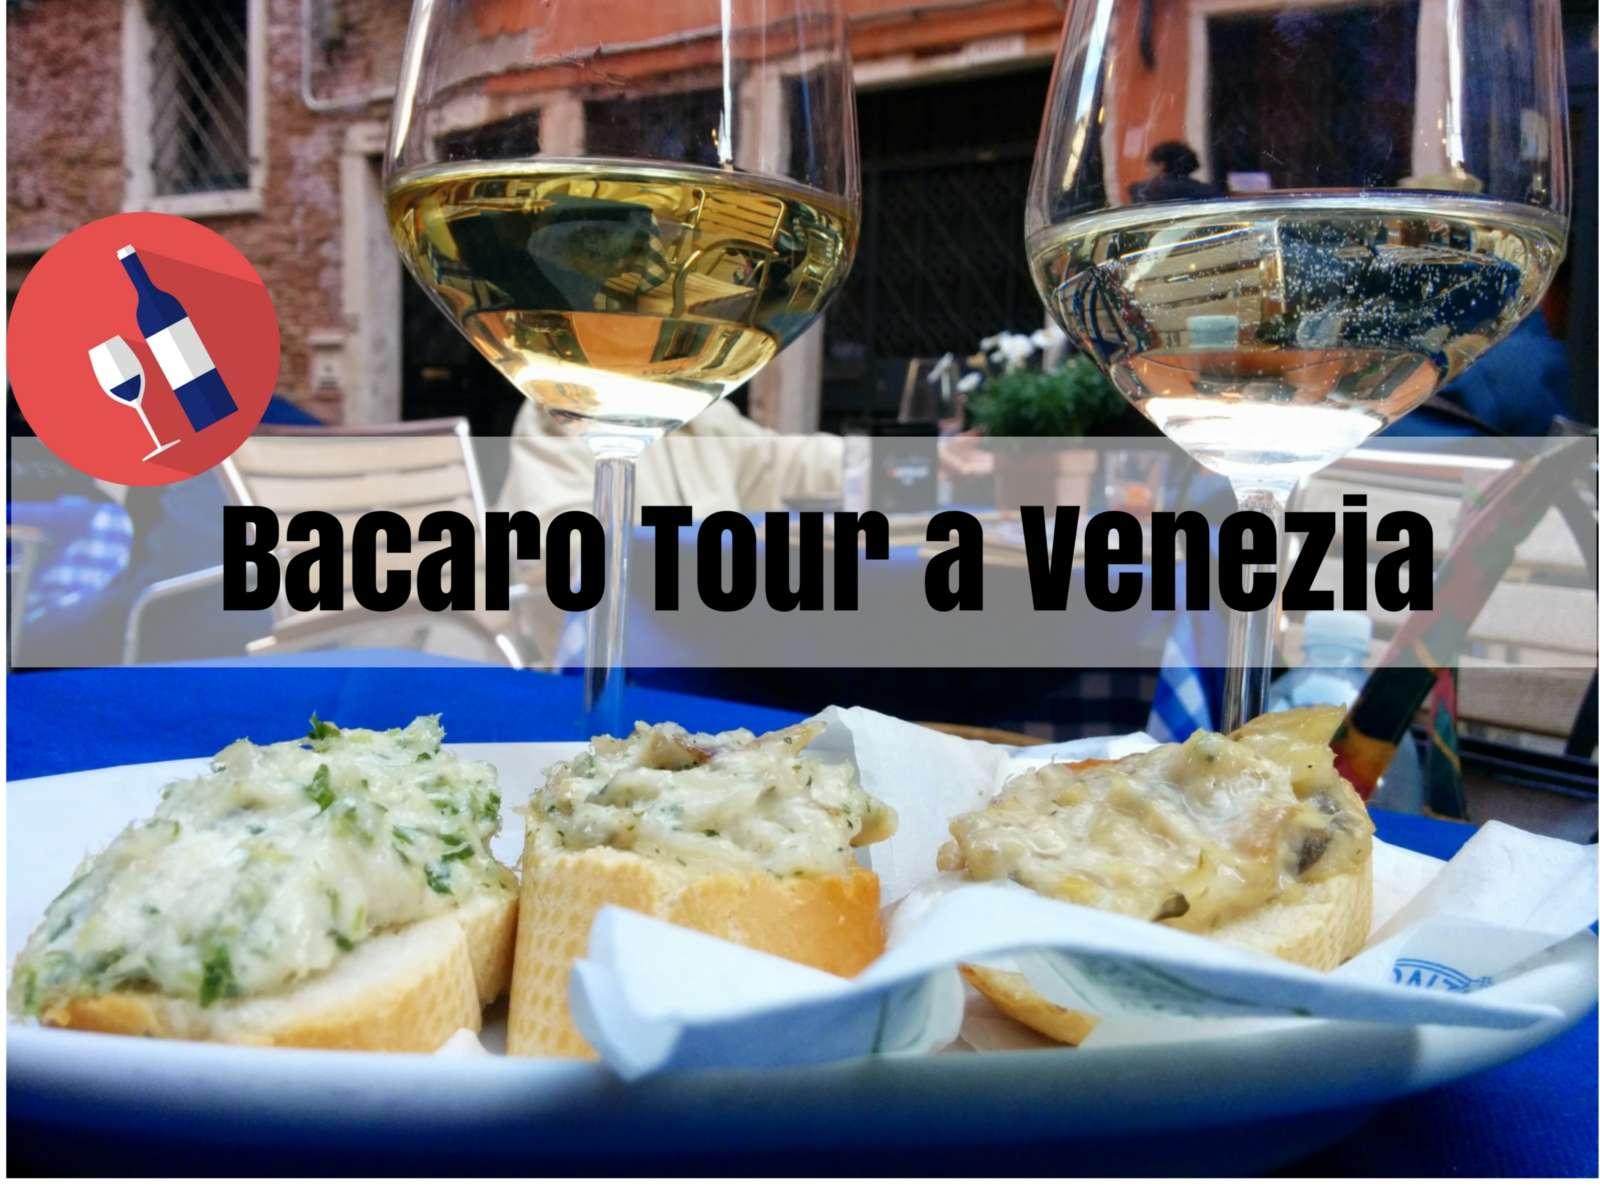 Bacaro tour a Venezia